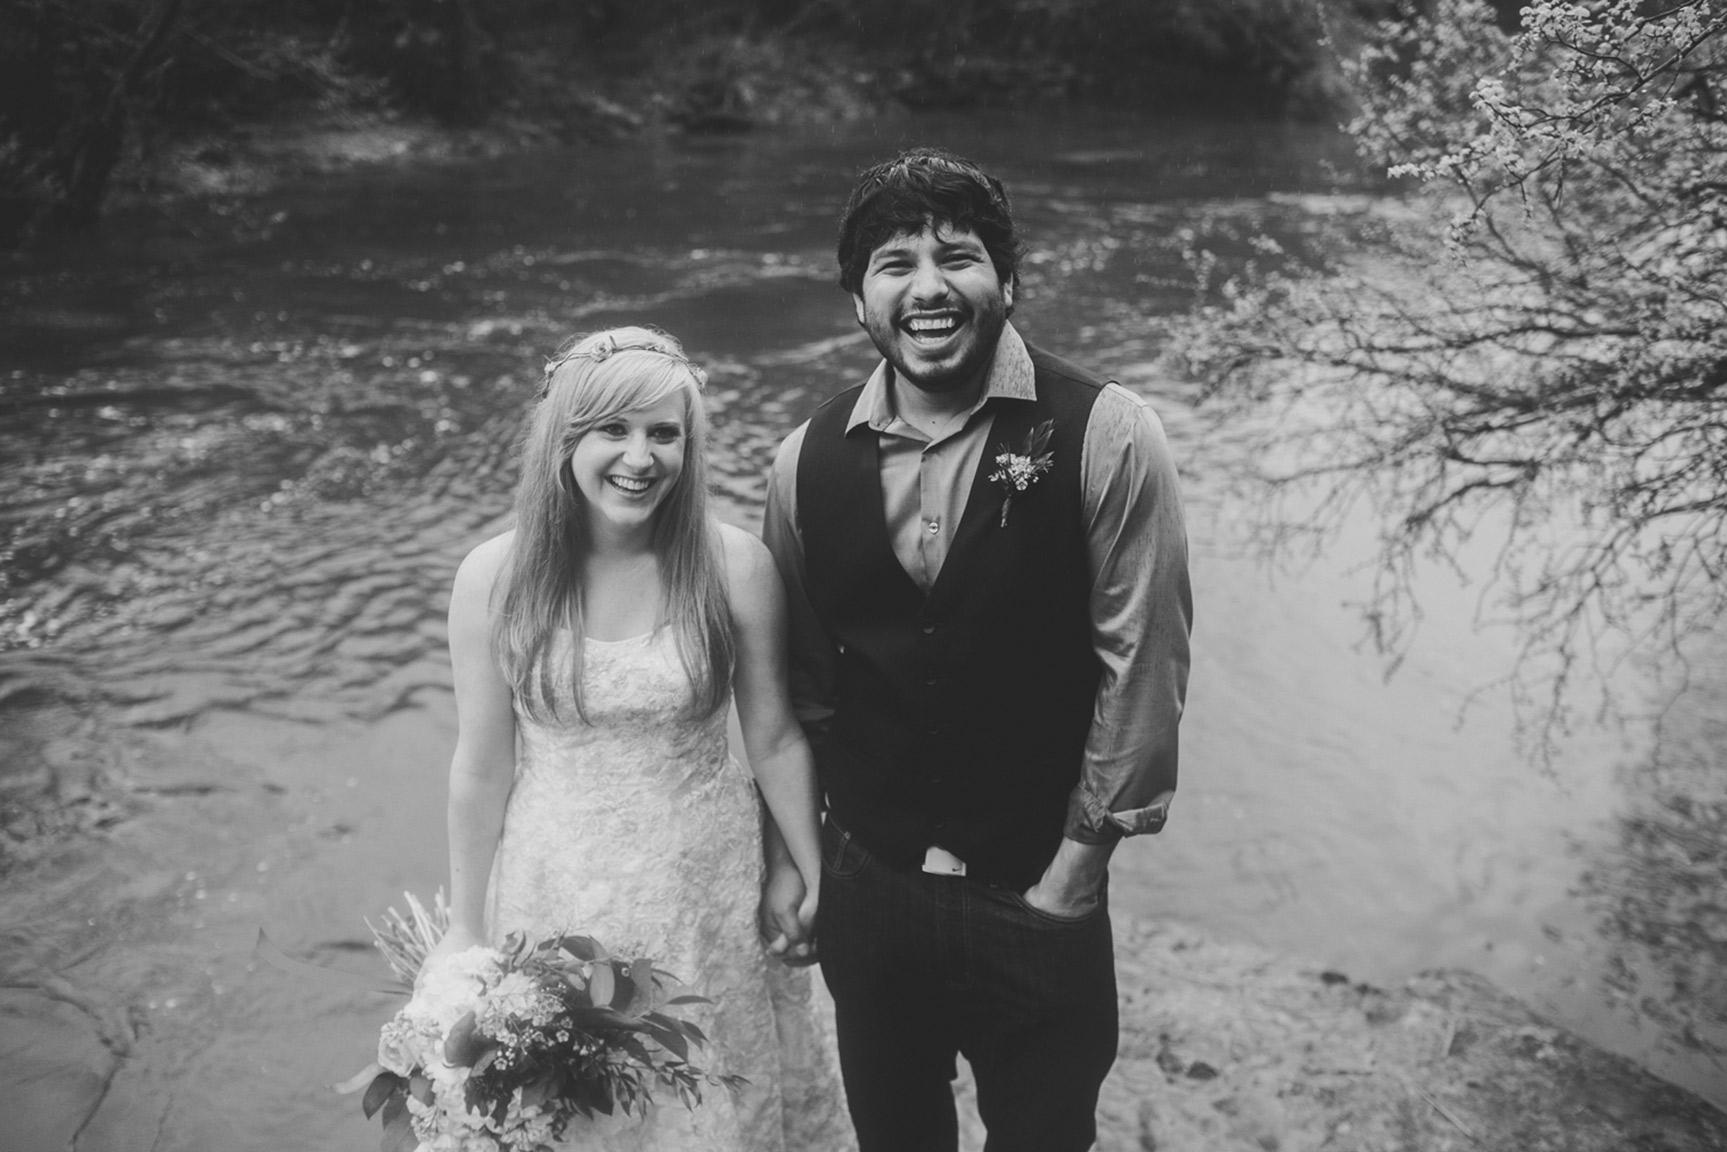 PhotobyBetsy-elopement020.jpg